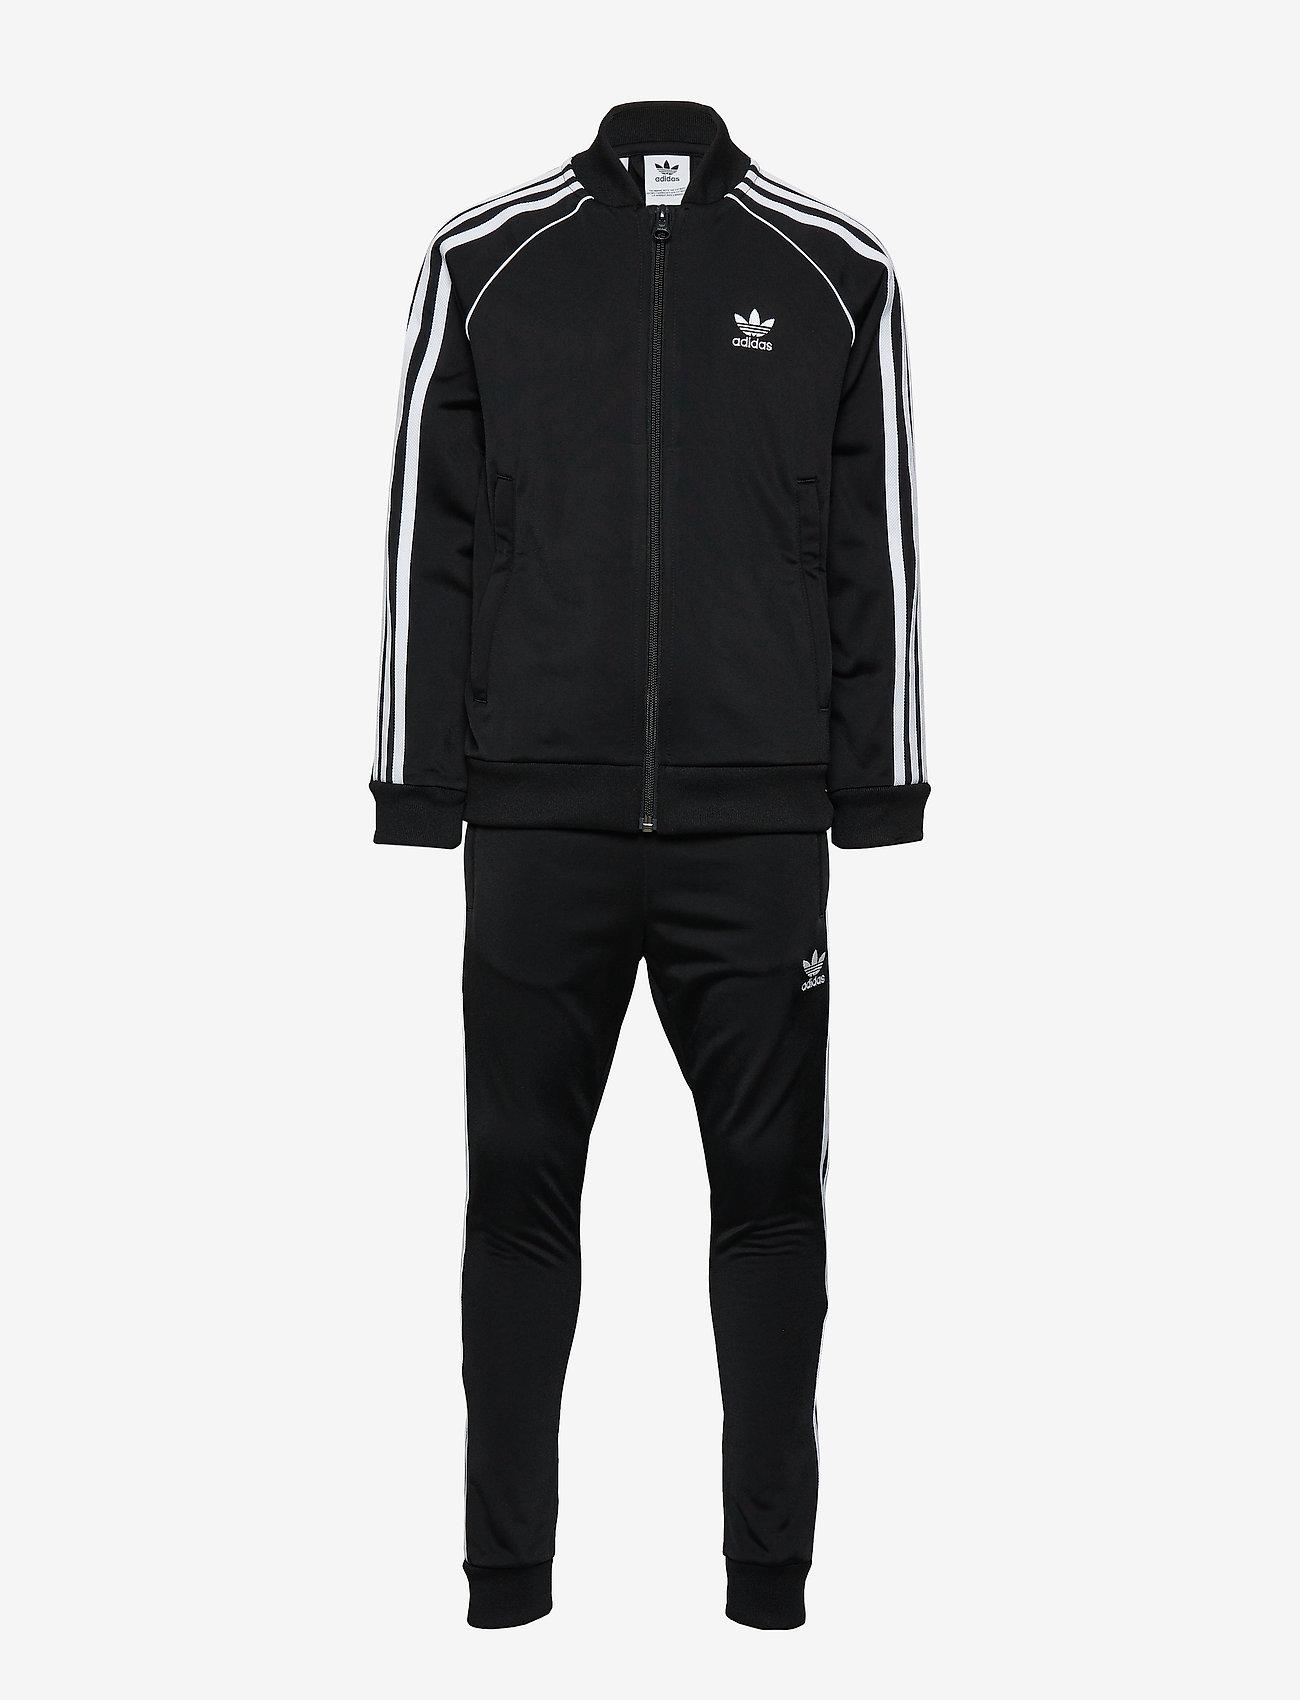 49.95 €) - adidas Originals -   Boozt